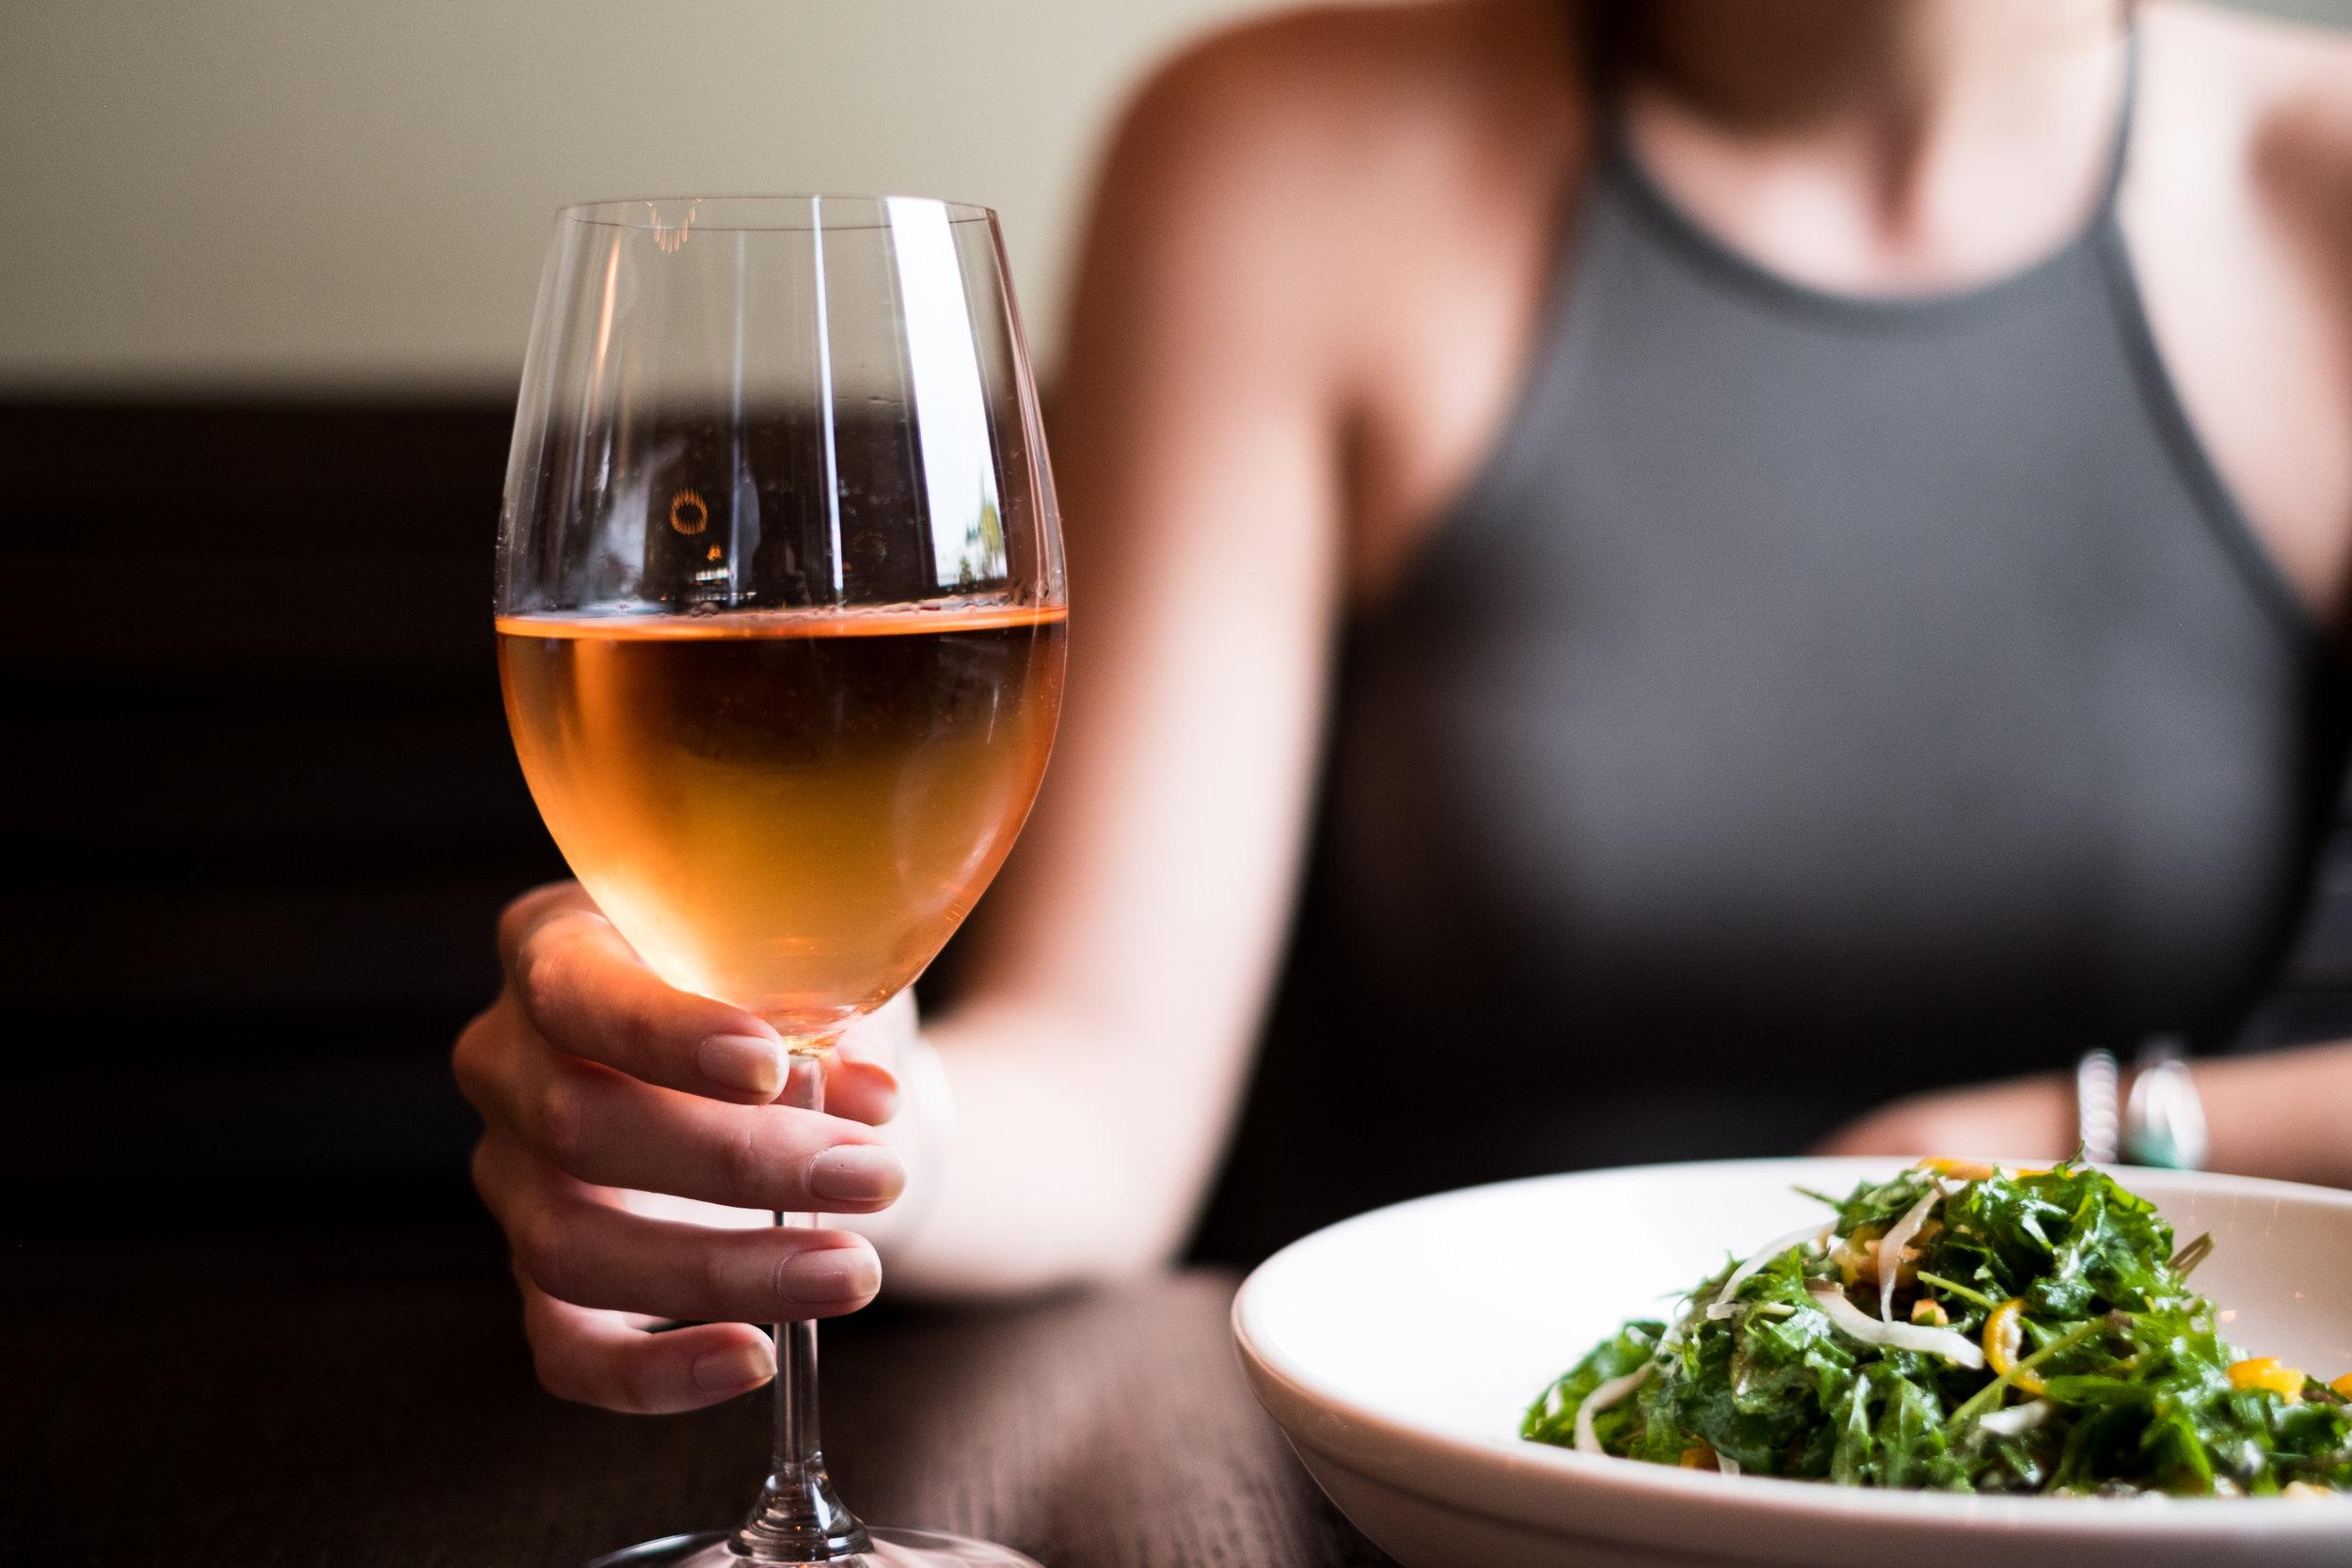 wine kale salad hands-5.jpg